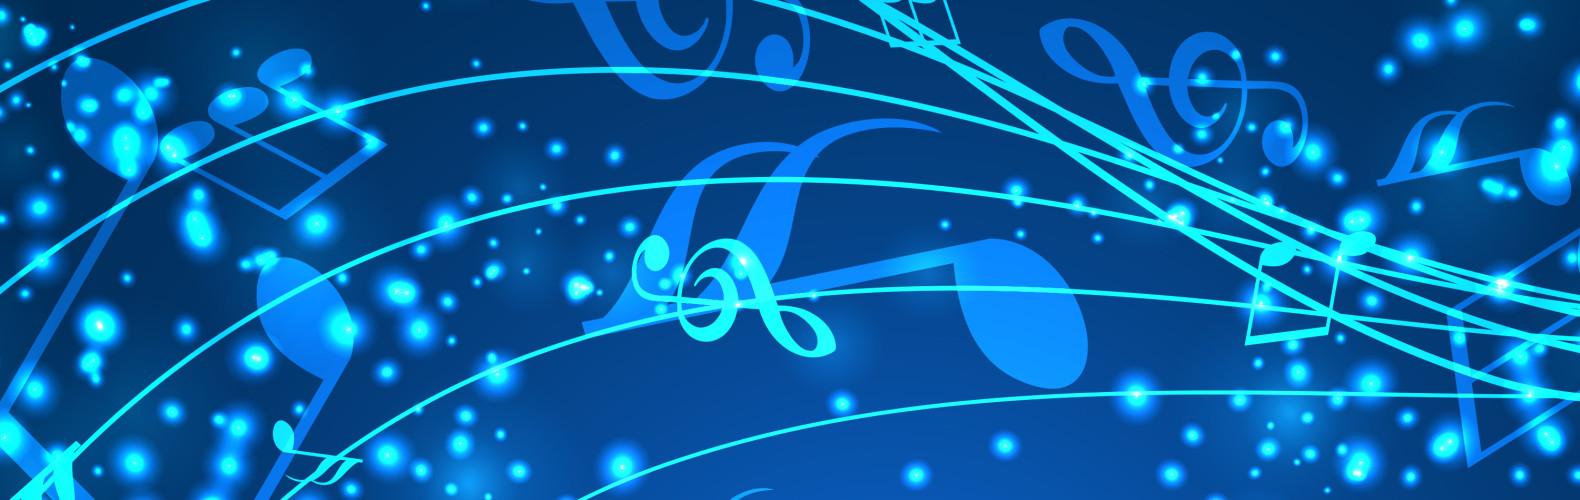 music_10064330-031914